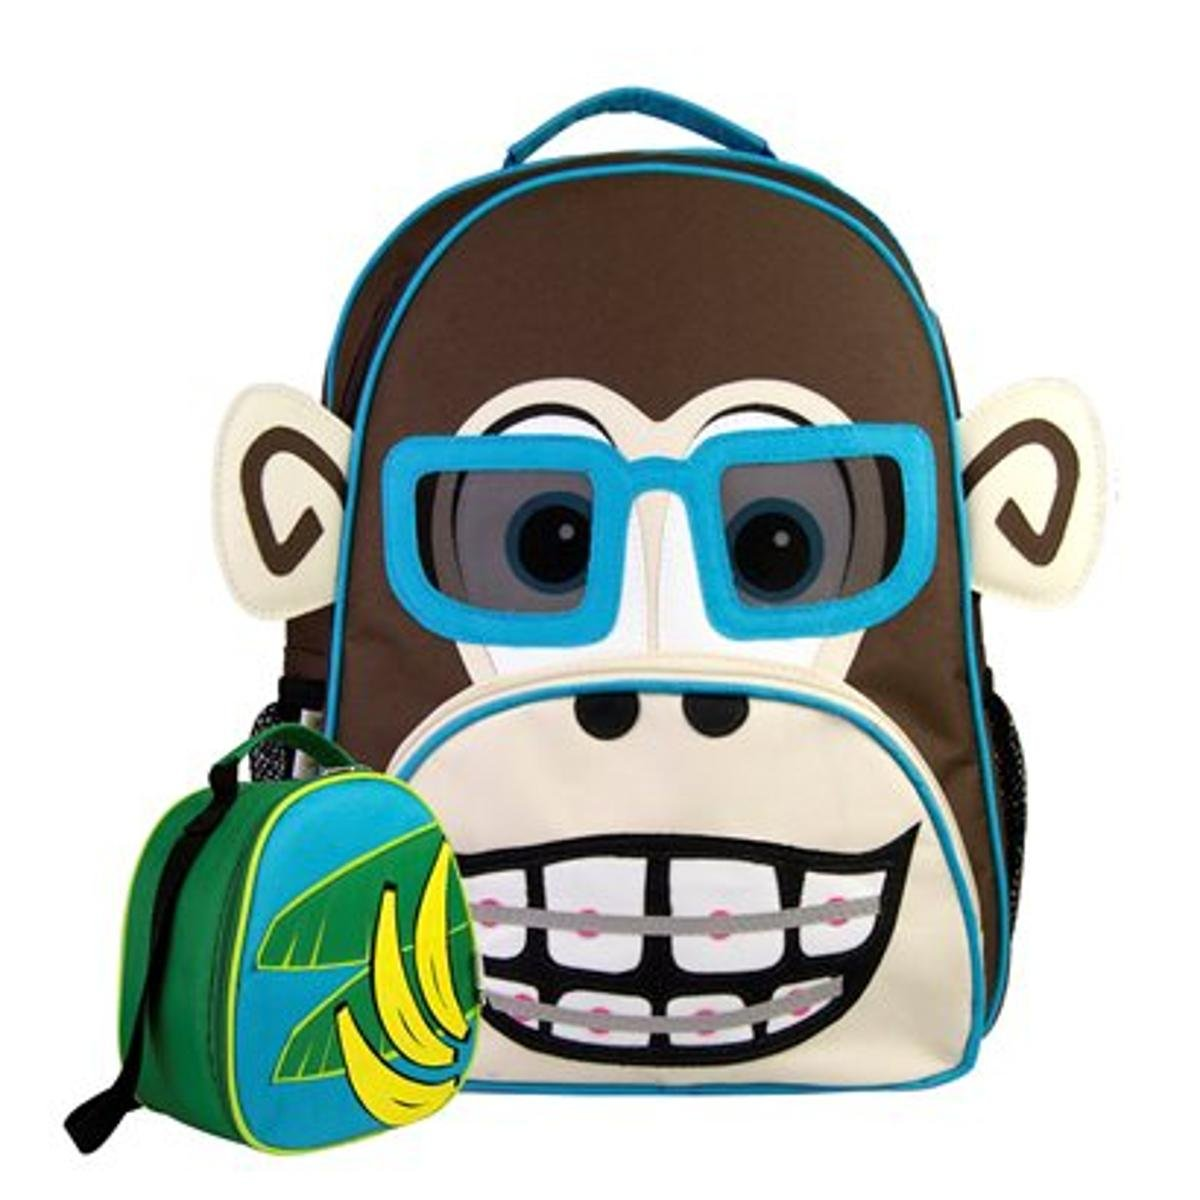 3b457af66 Kit Infantil Mochila Escolar Mumagi + Lancheira Macaco Kinho Masculino .